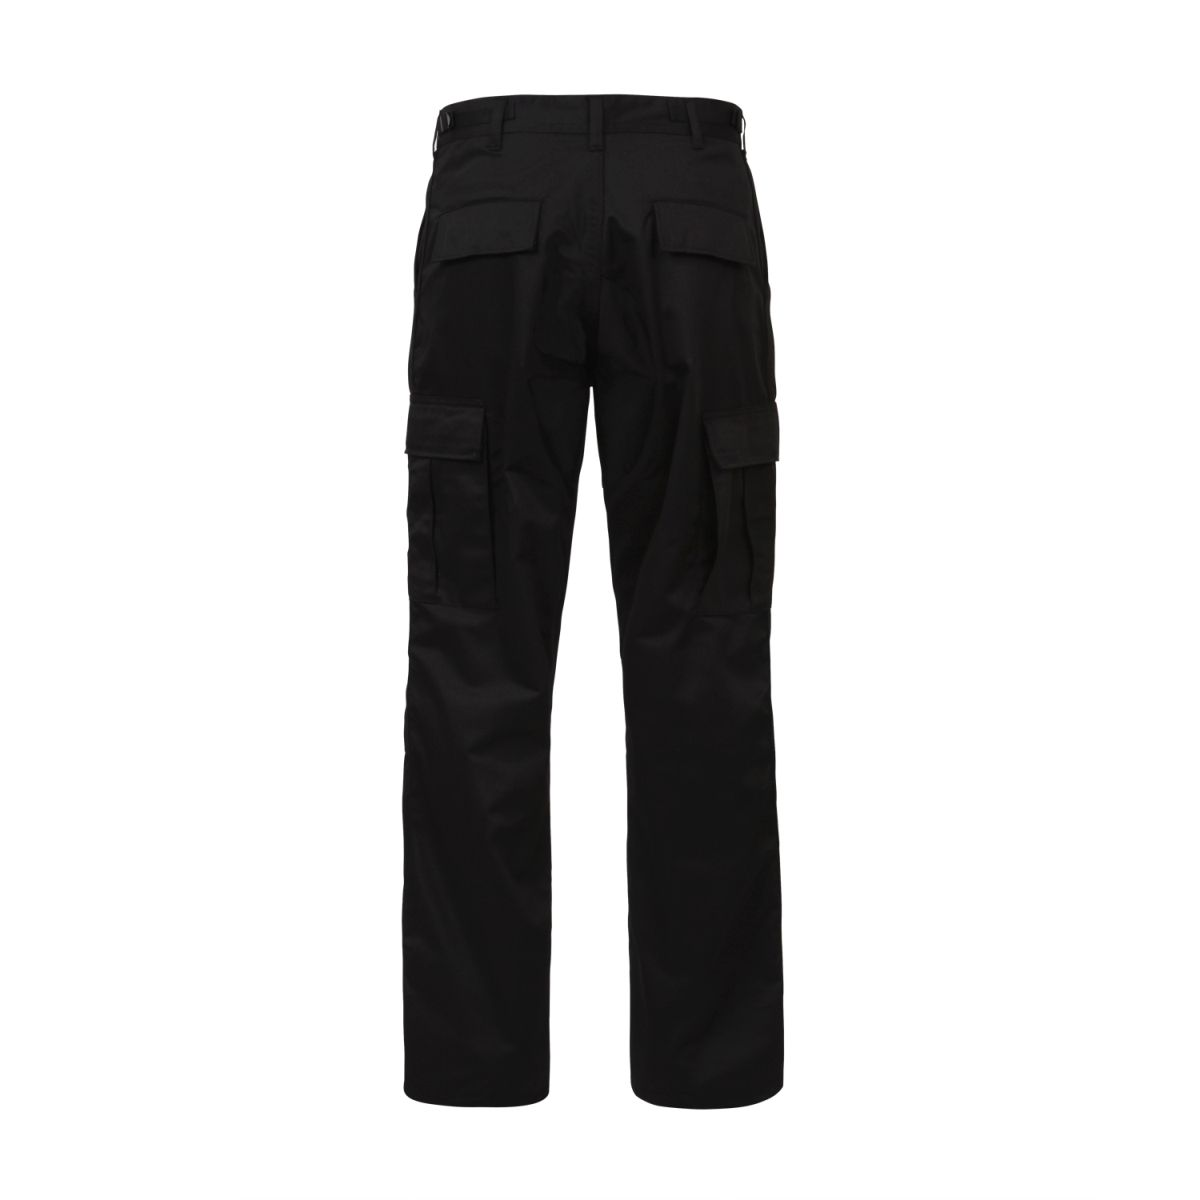 Pants BDU ZIPPER FLY RELAXED BLACK ROTHCO 2971 L-11